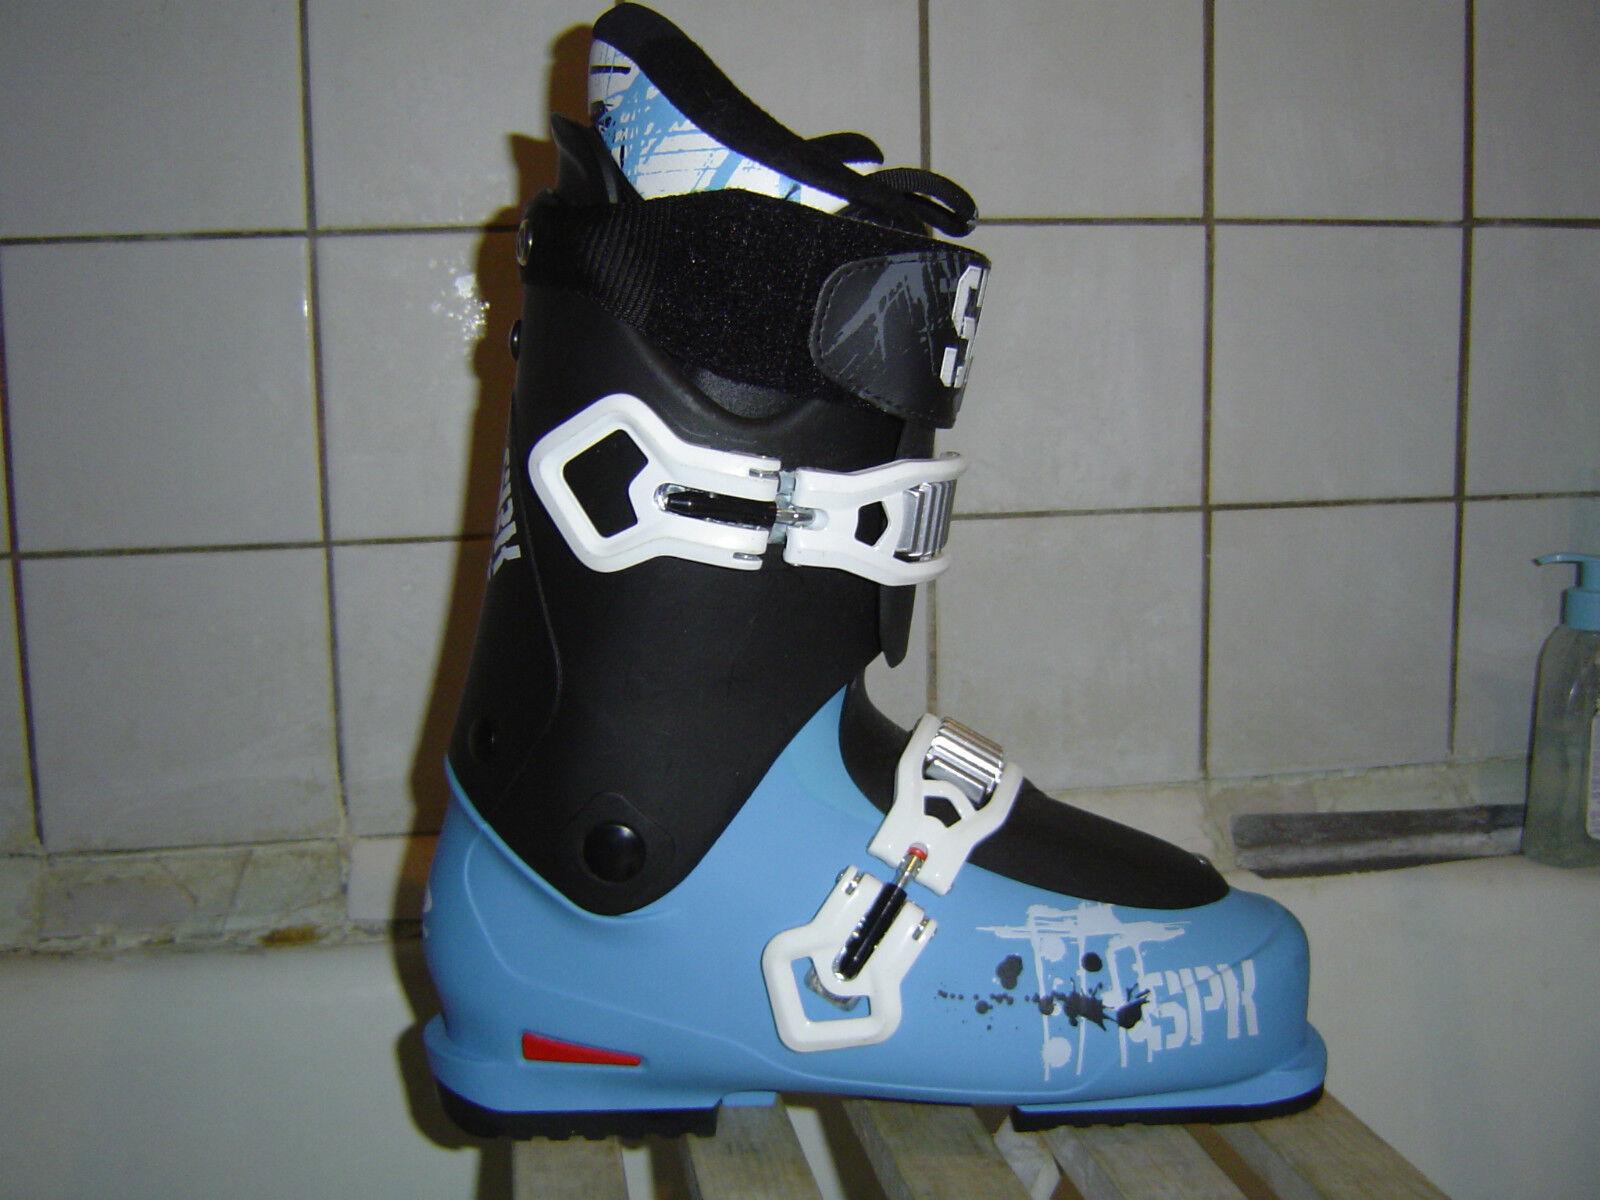 Salomon SPK Freestyle  ski Stiefel,28.5 men Größe,new